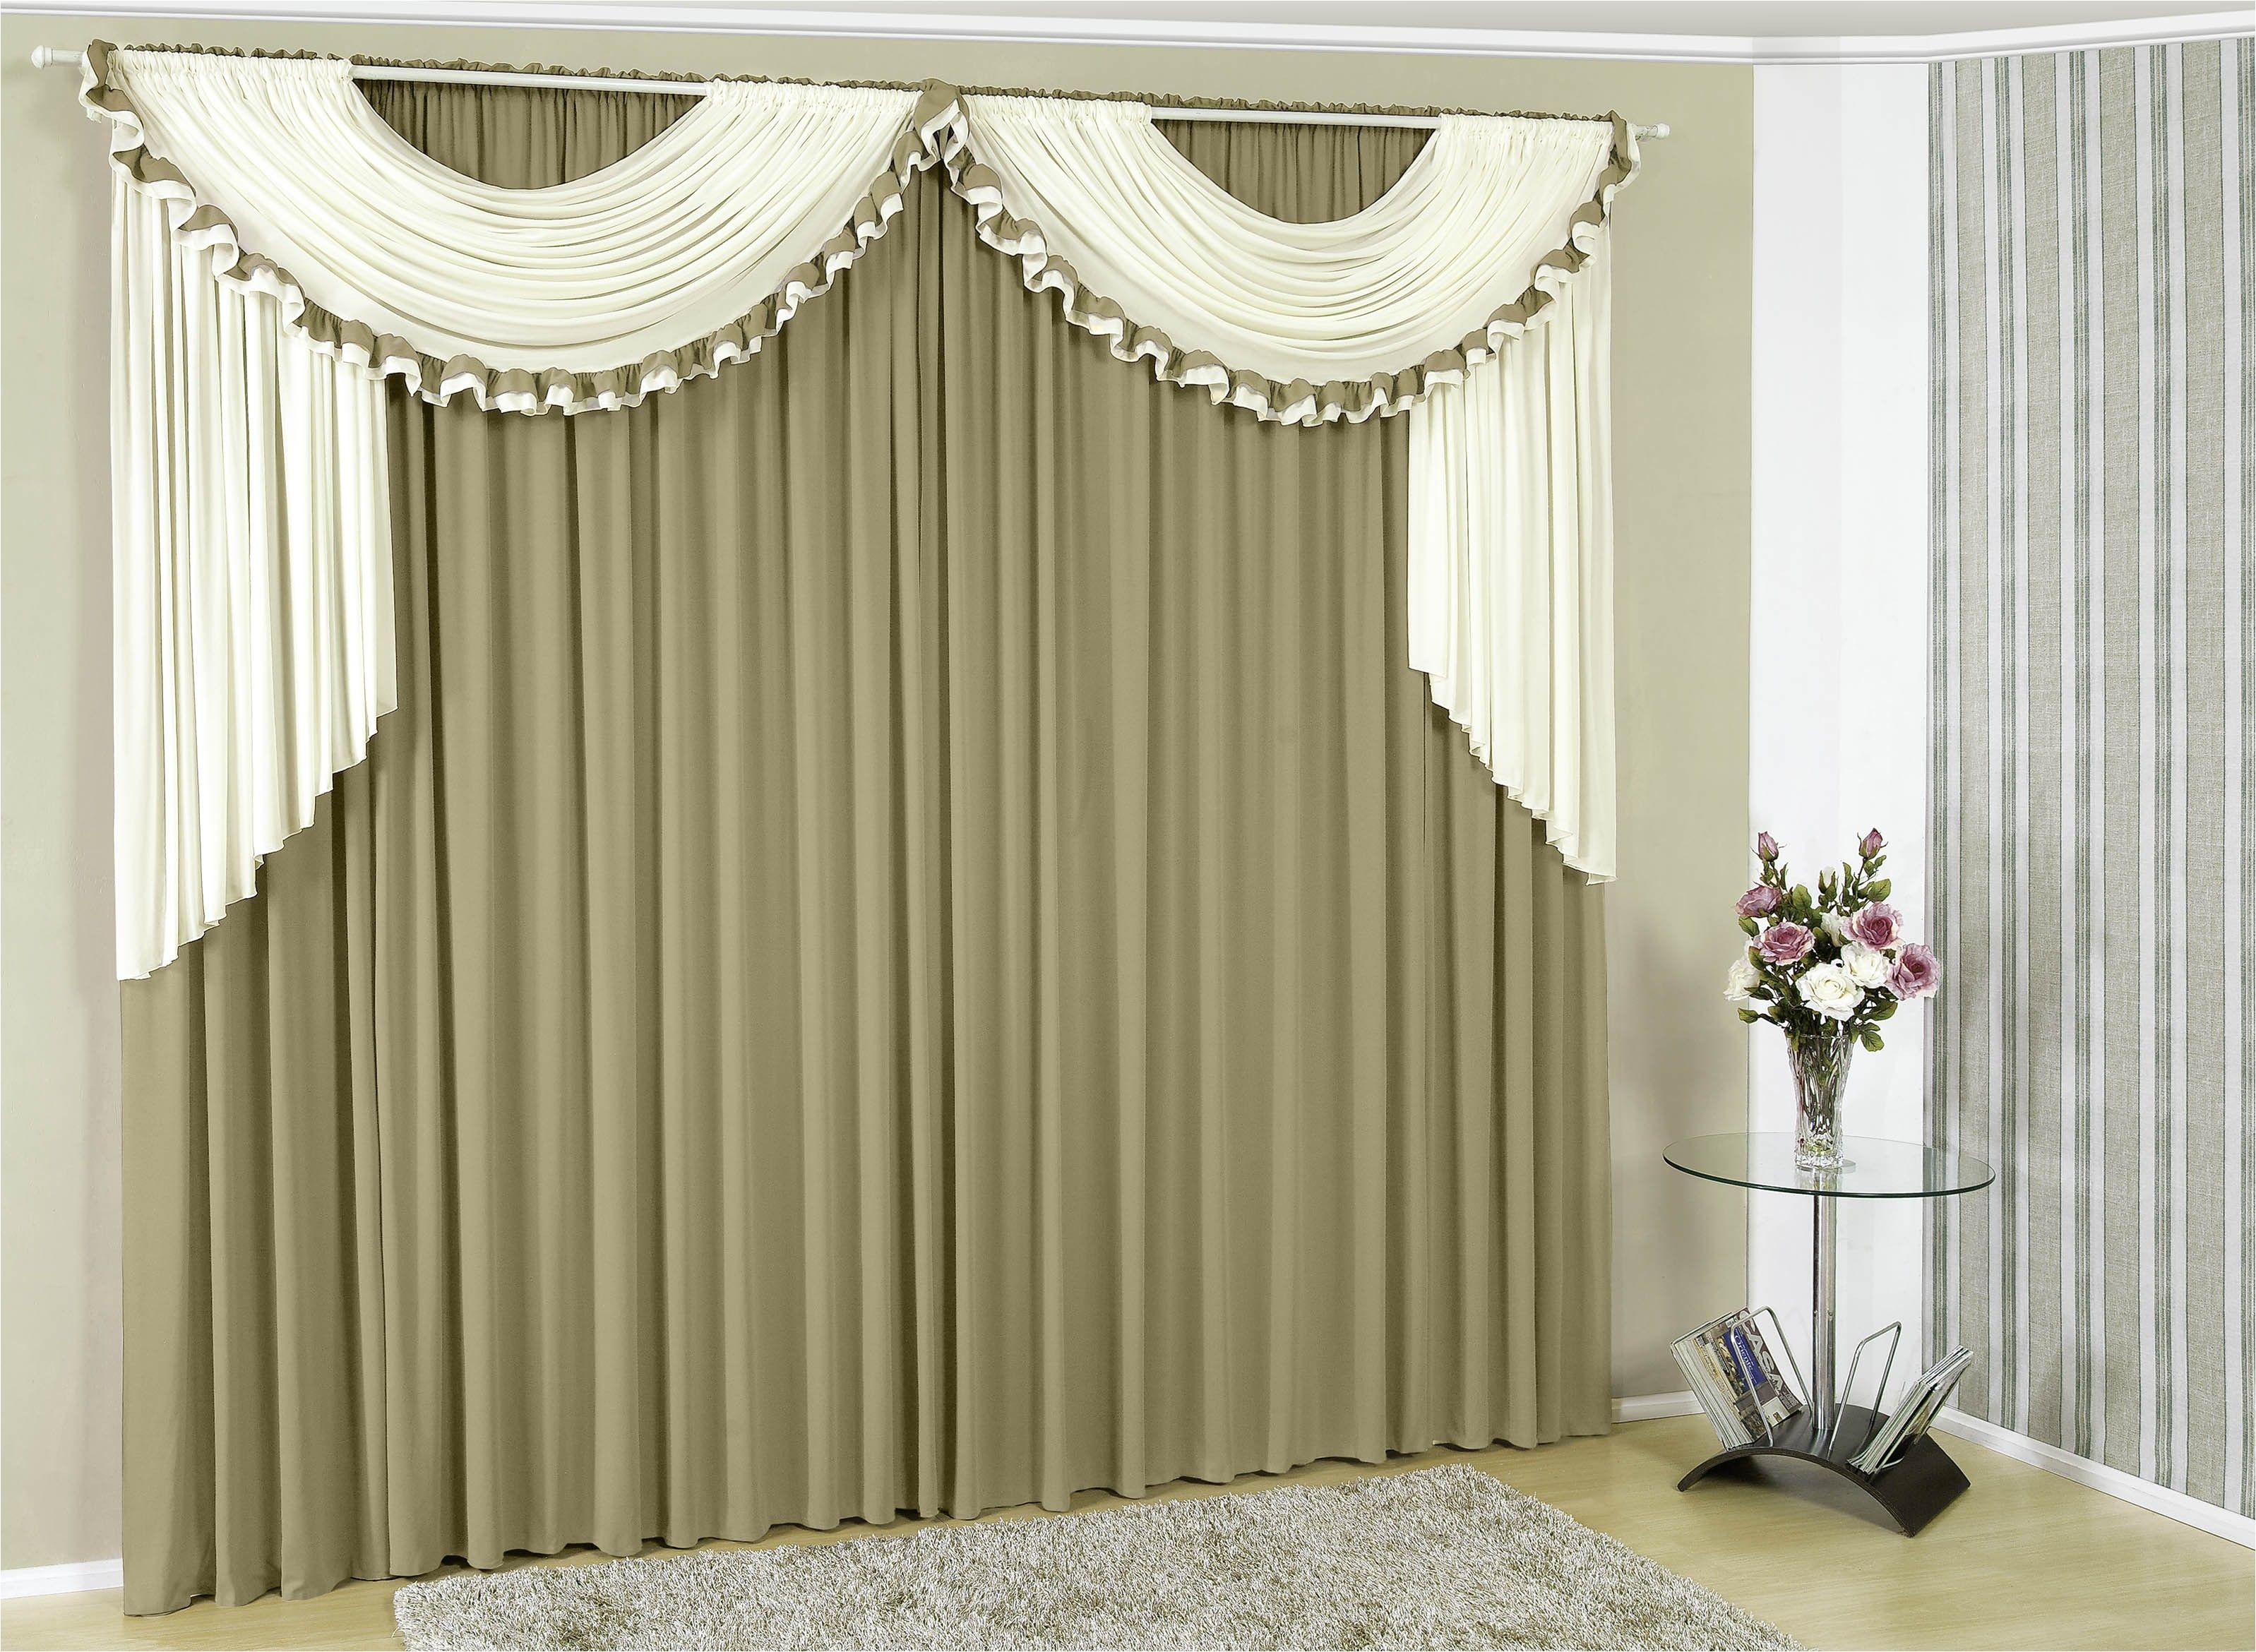 cortina gisele 3 00m x 2 50m p vara o duplo toda em malha